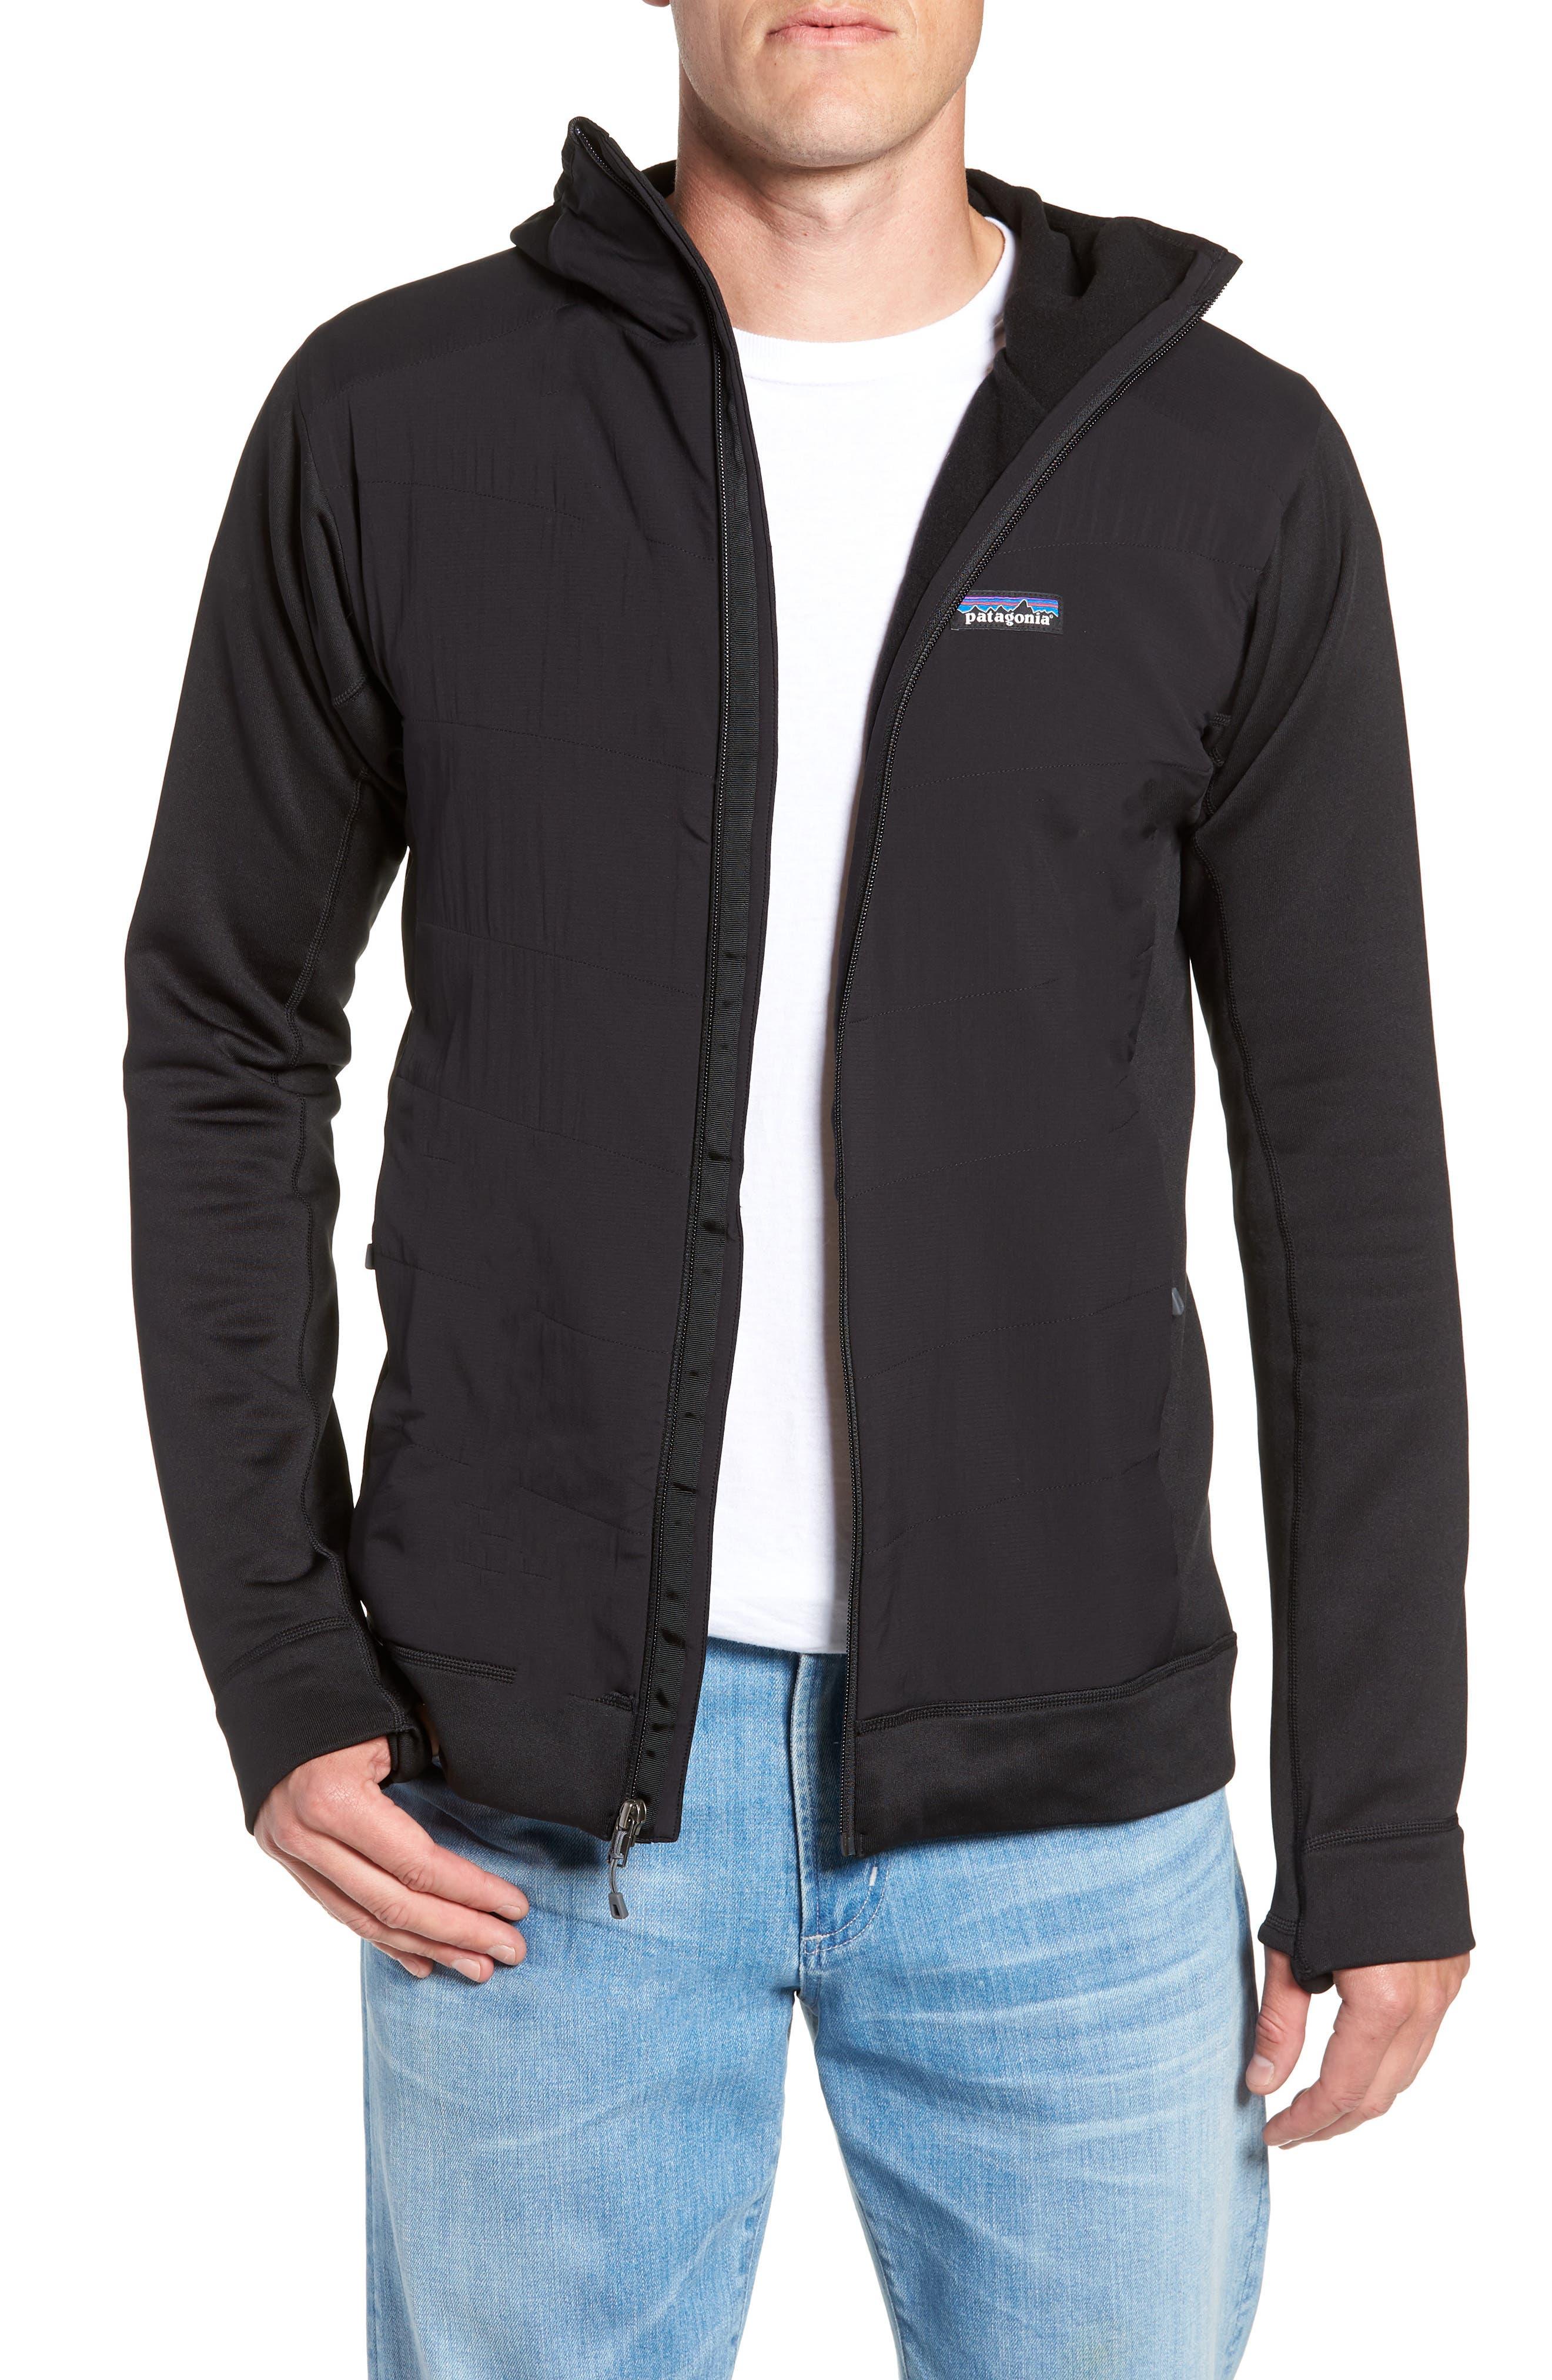 Crosstek Hybrid Hooded Jacket,                             Main thumbnail 1, color,                             BLACK